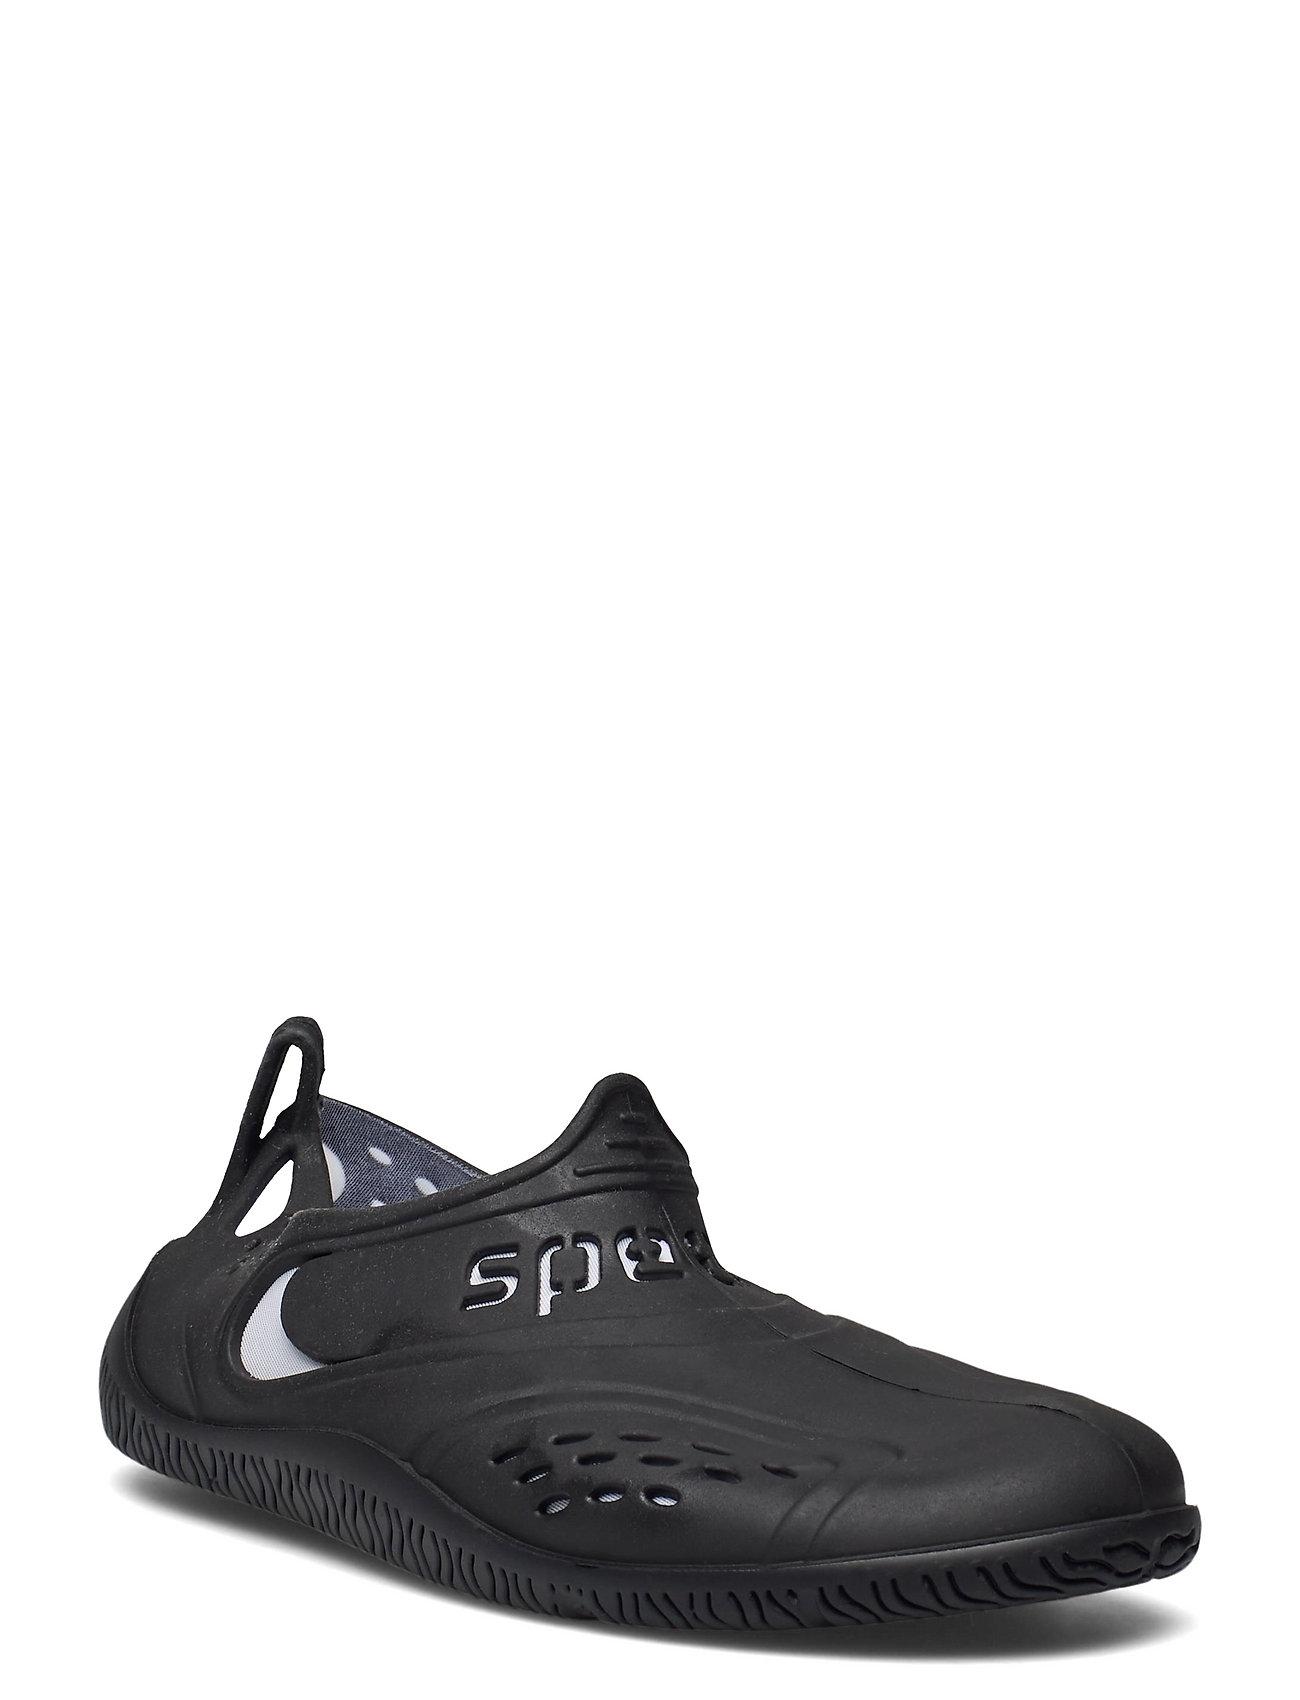 Speedo Zanpa Af, Black/White Shoes Summer Shoes Pool Sliders Sort Speedo